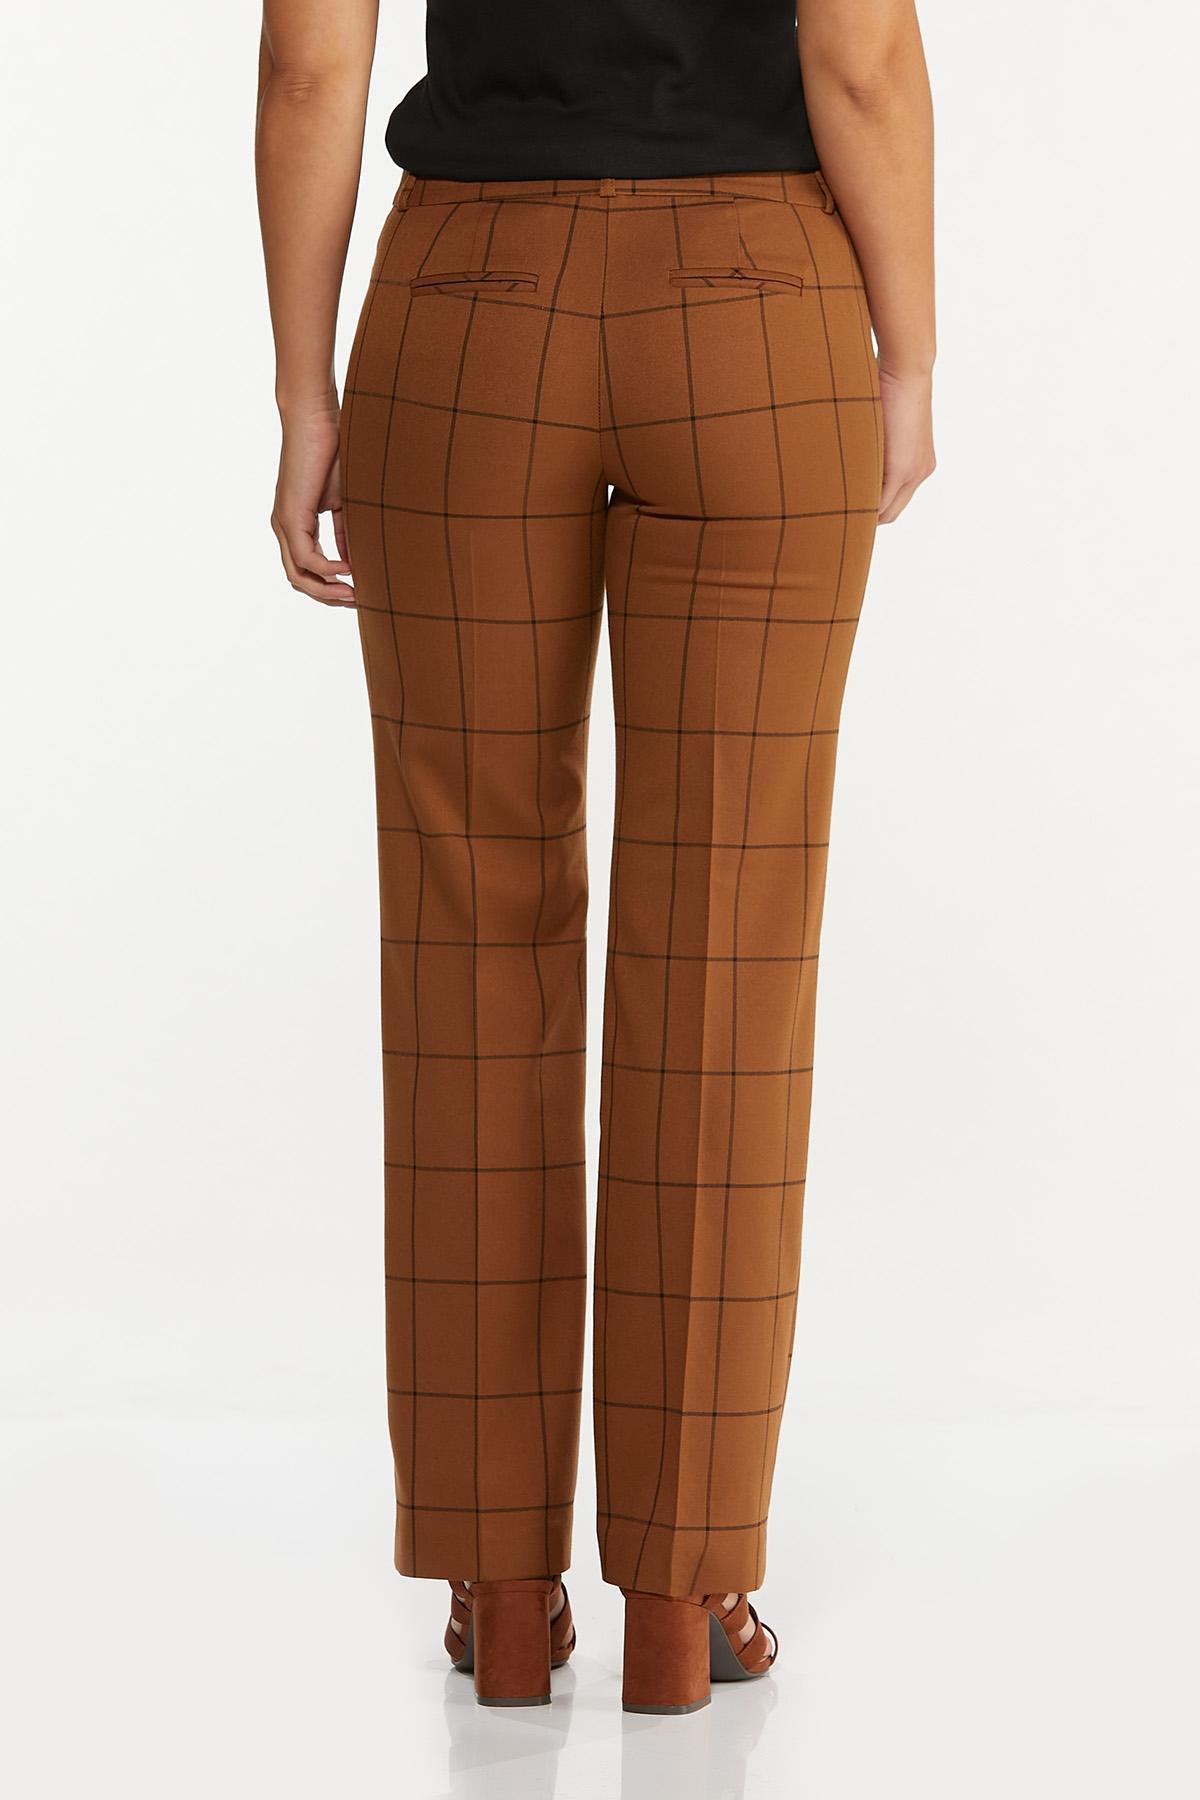 Windowpane Trouser Pants (Item #44661275)